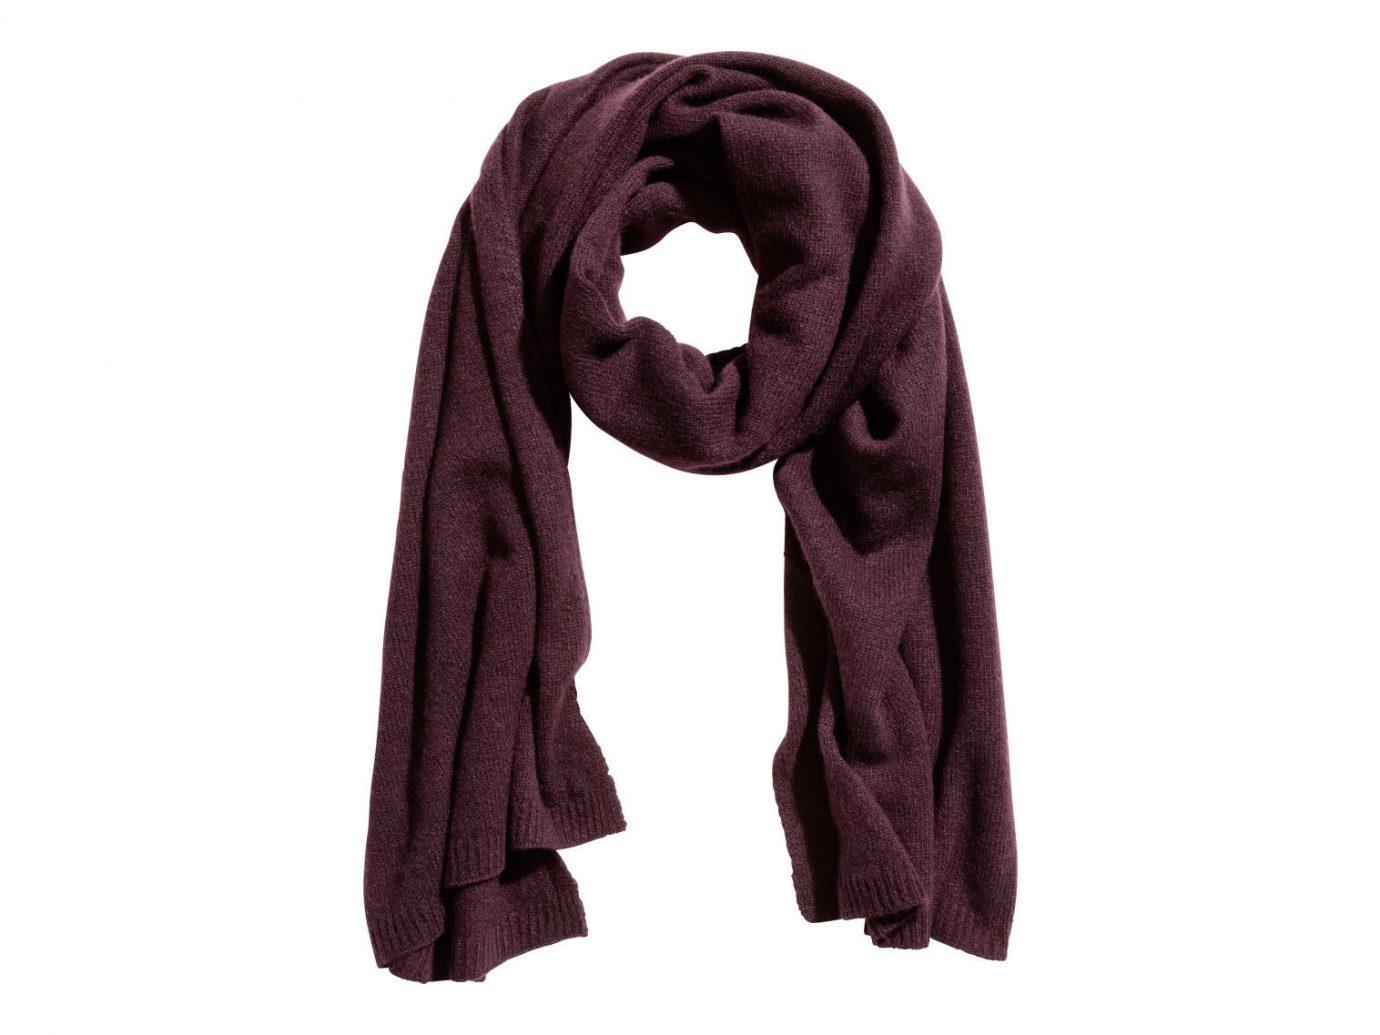 Travel Shop clothing scarf stole wearing shawl woolen